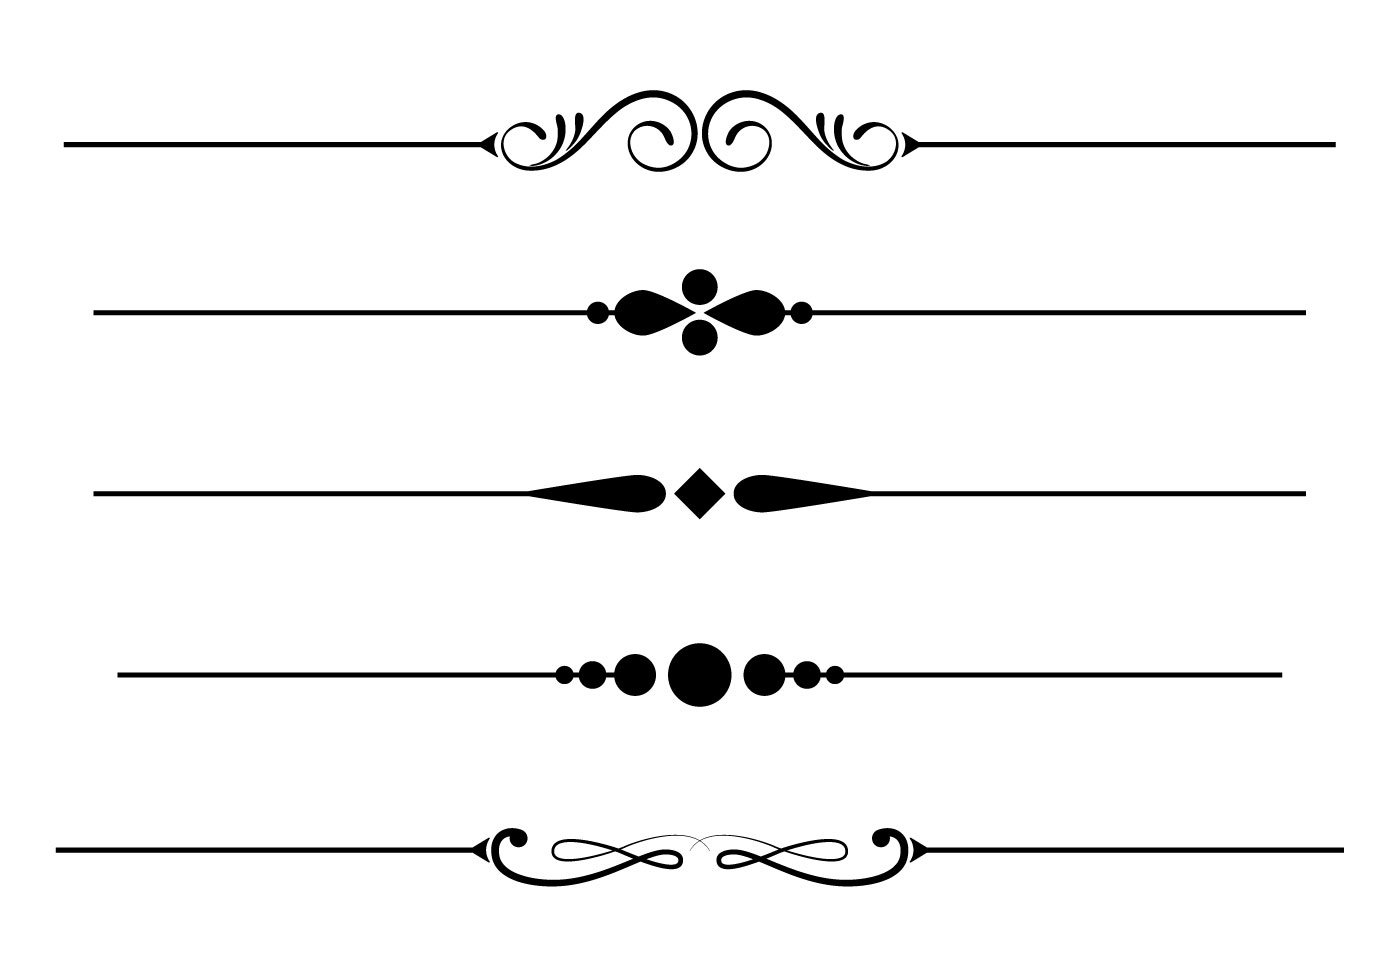 Black elegant underline clipart high def image stock Fancy Underline Free Vector Art - (1,825 Free Downloads) image stock